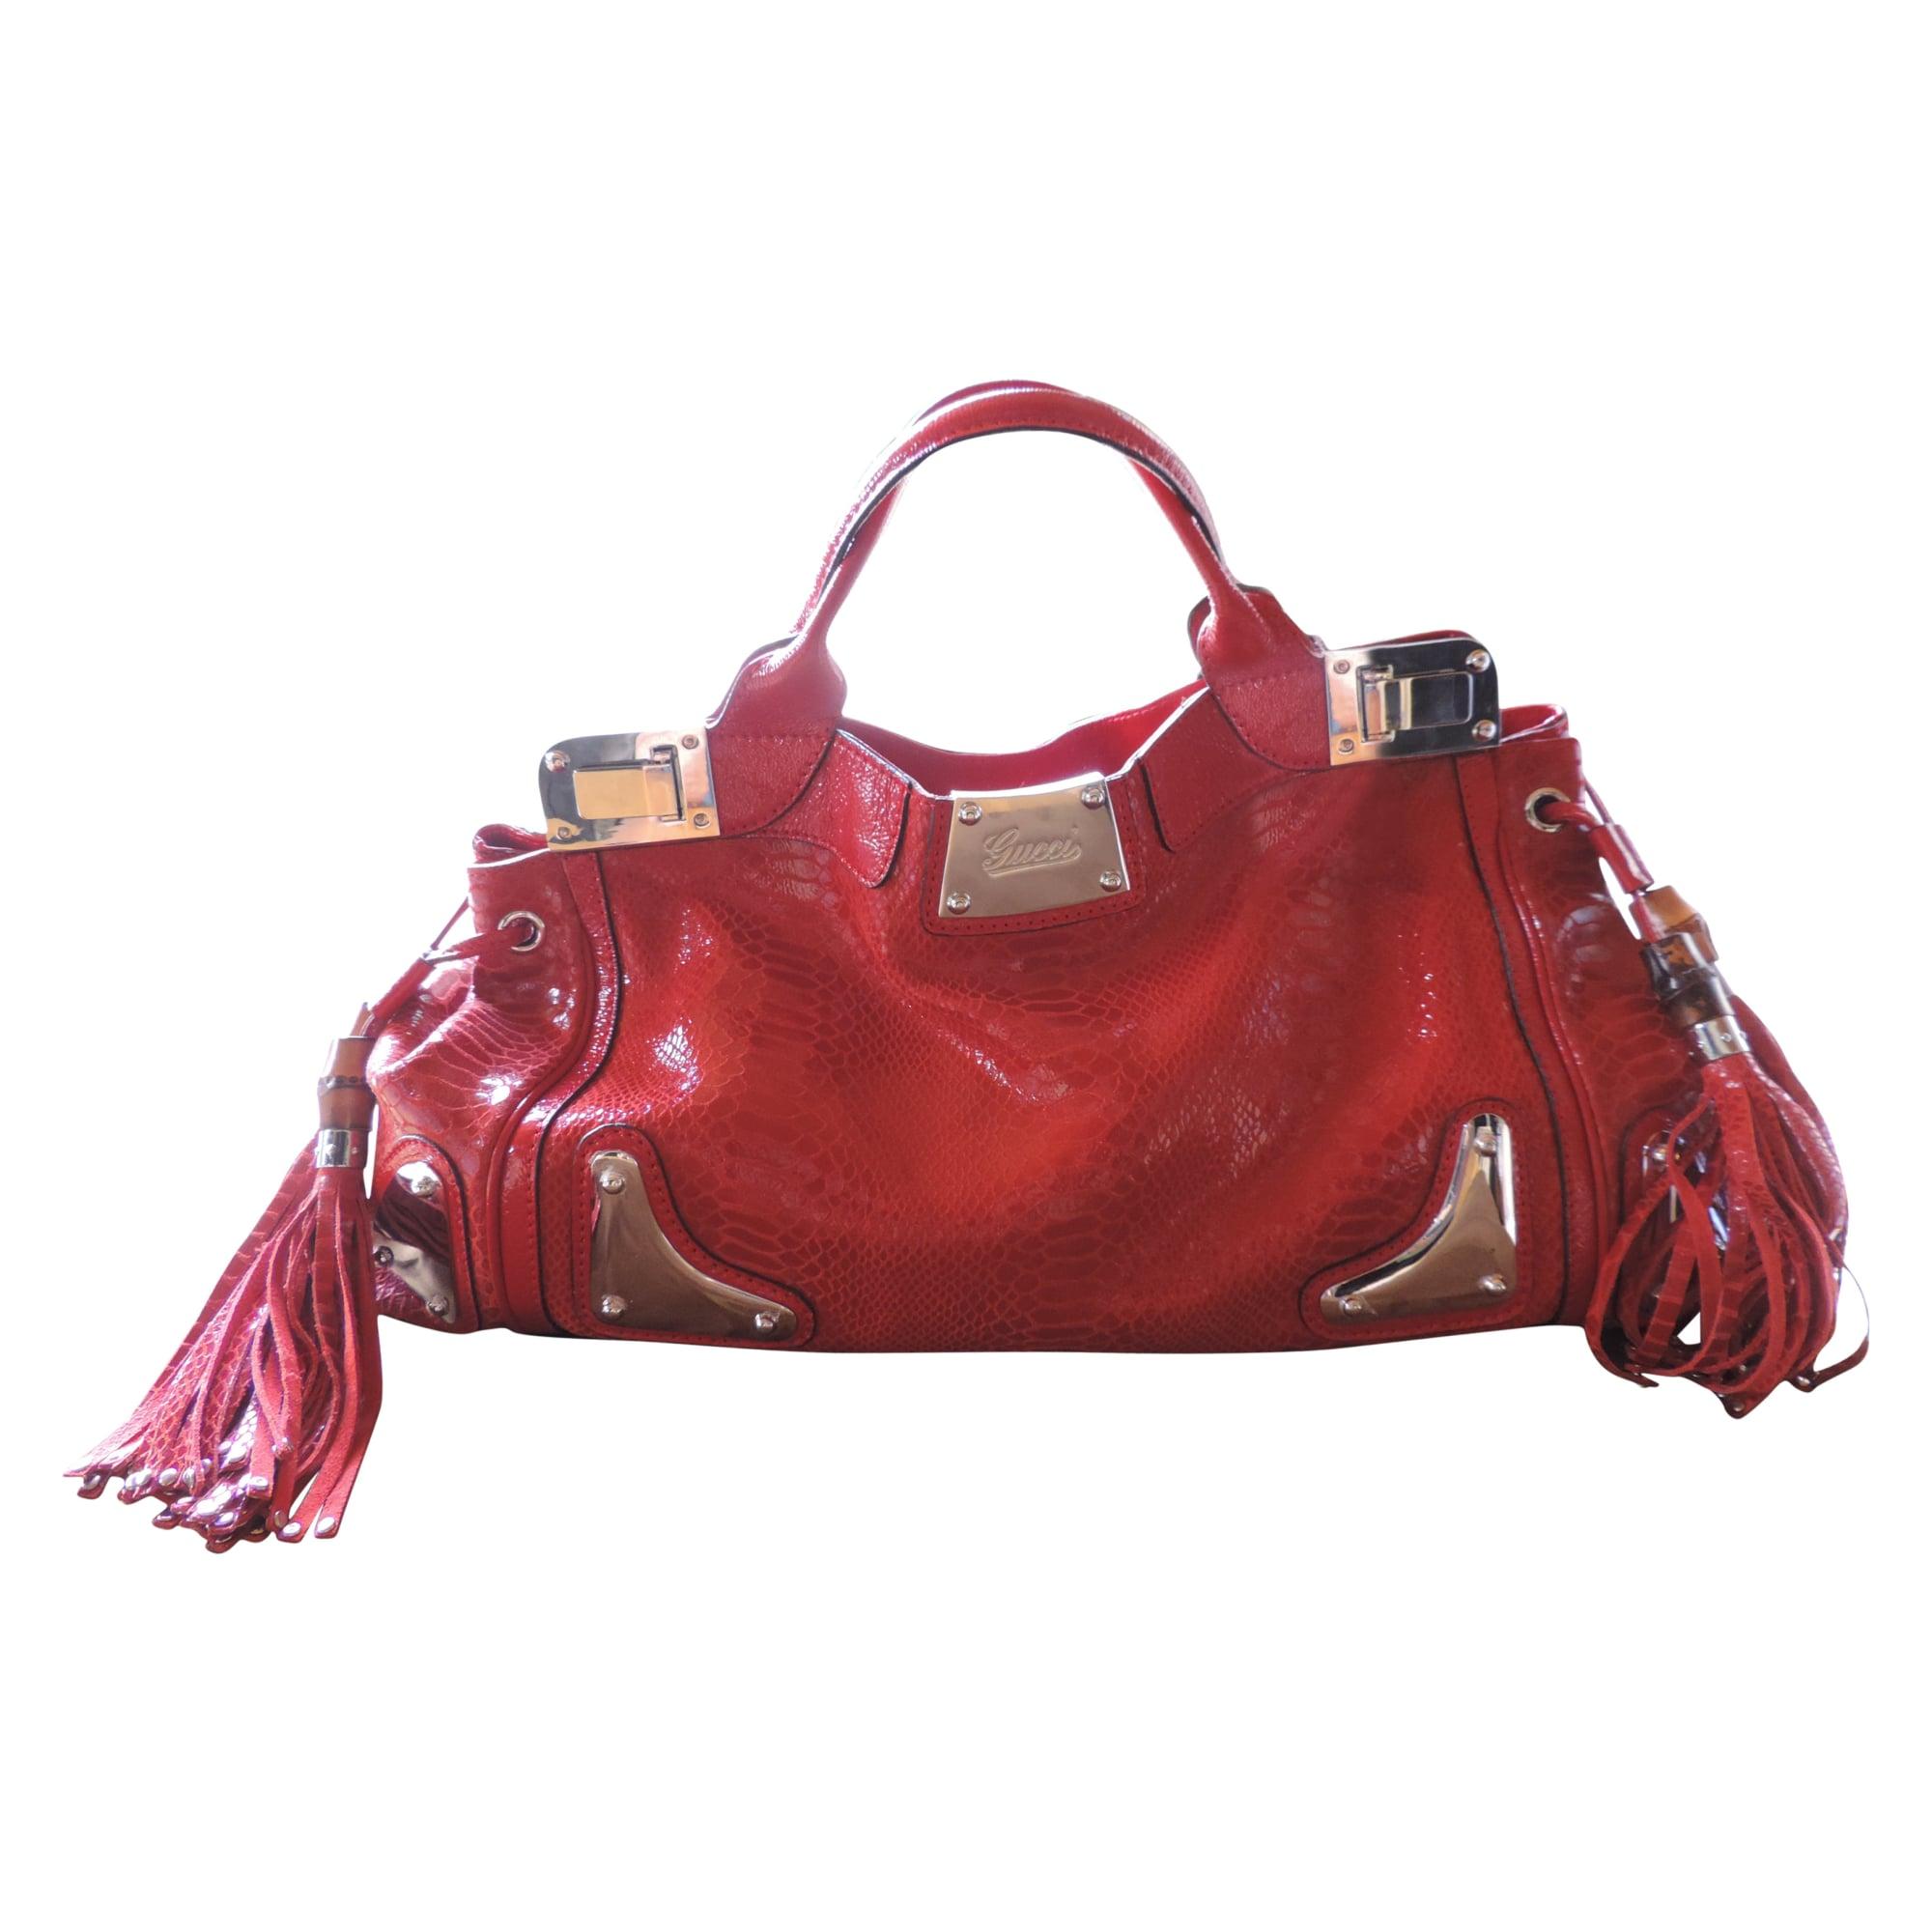 Sac à main en cuir GUCCI rouge vendu par J aimetiffany - 2625325 540a173adb6